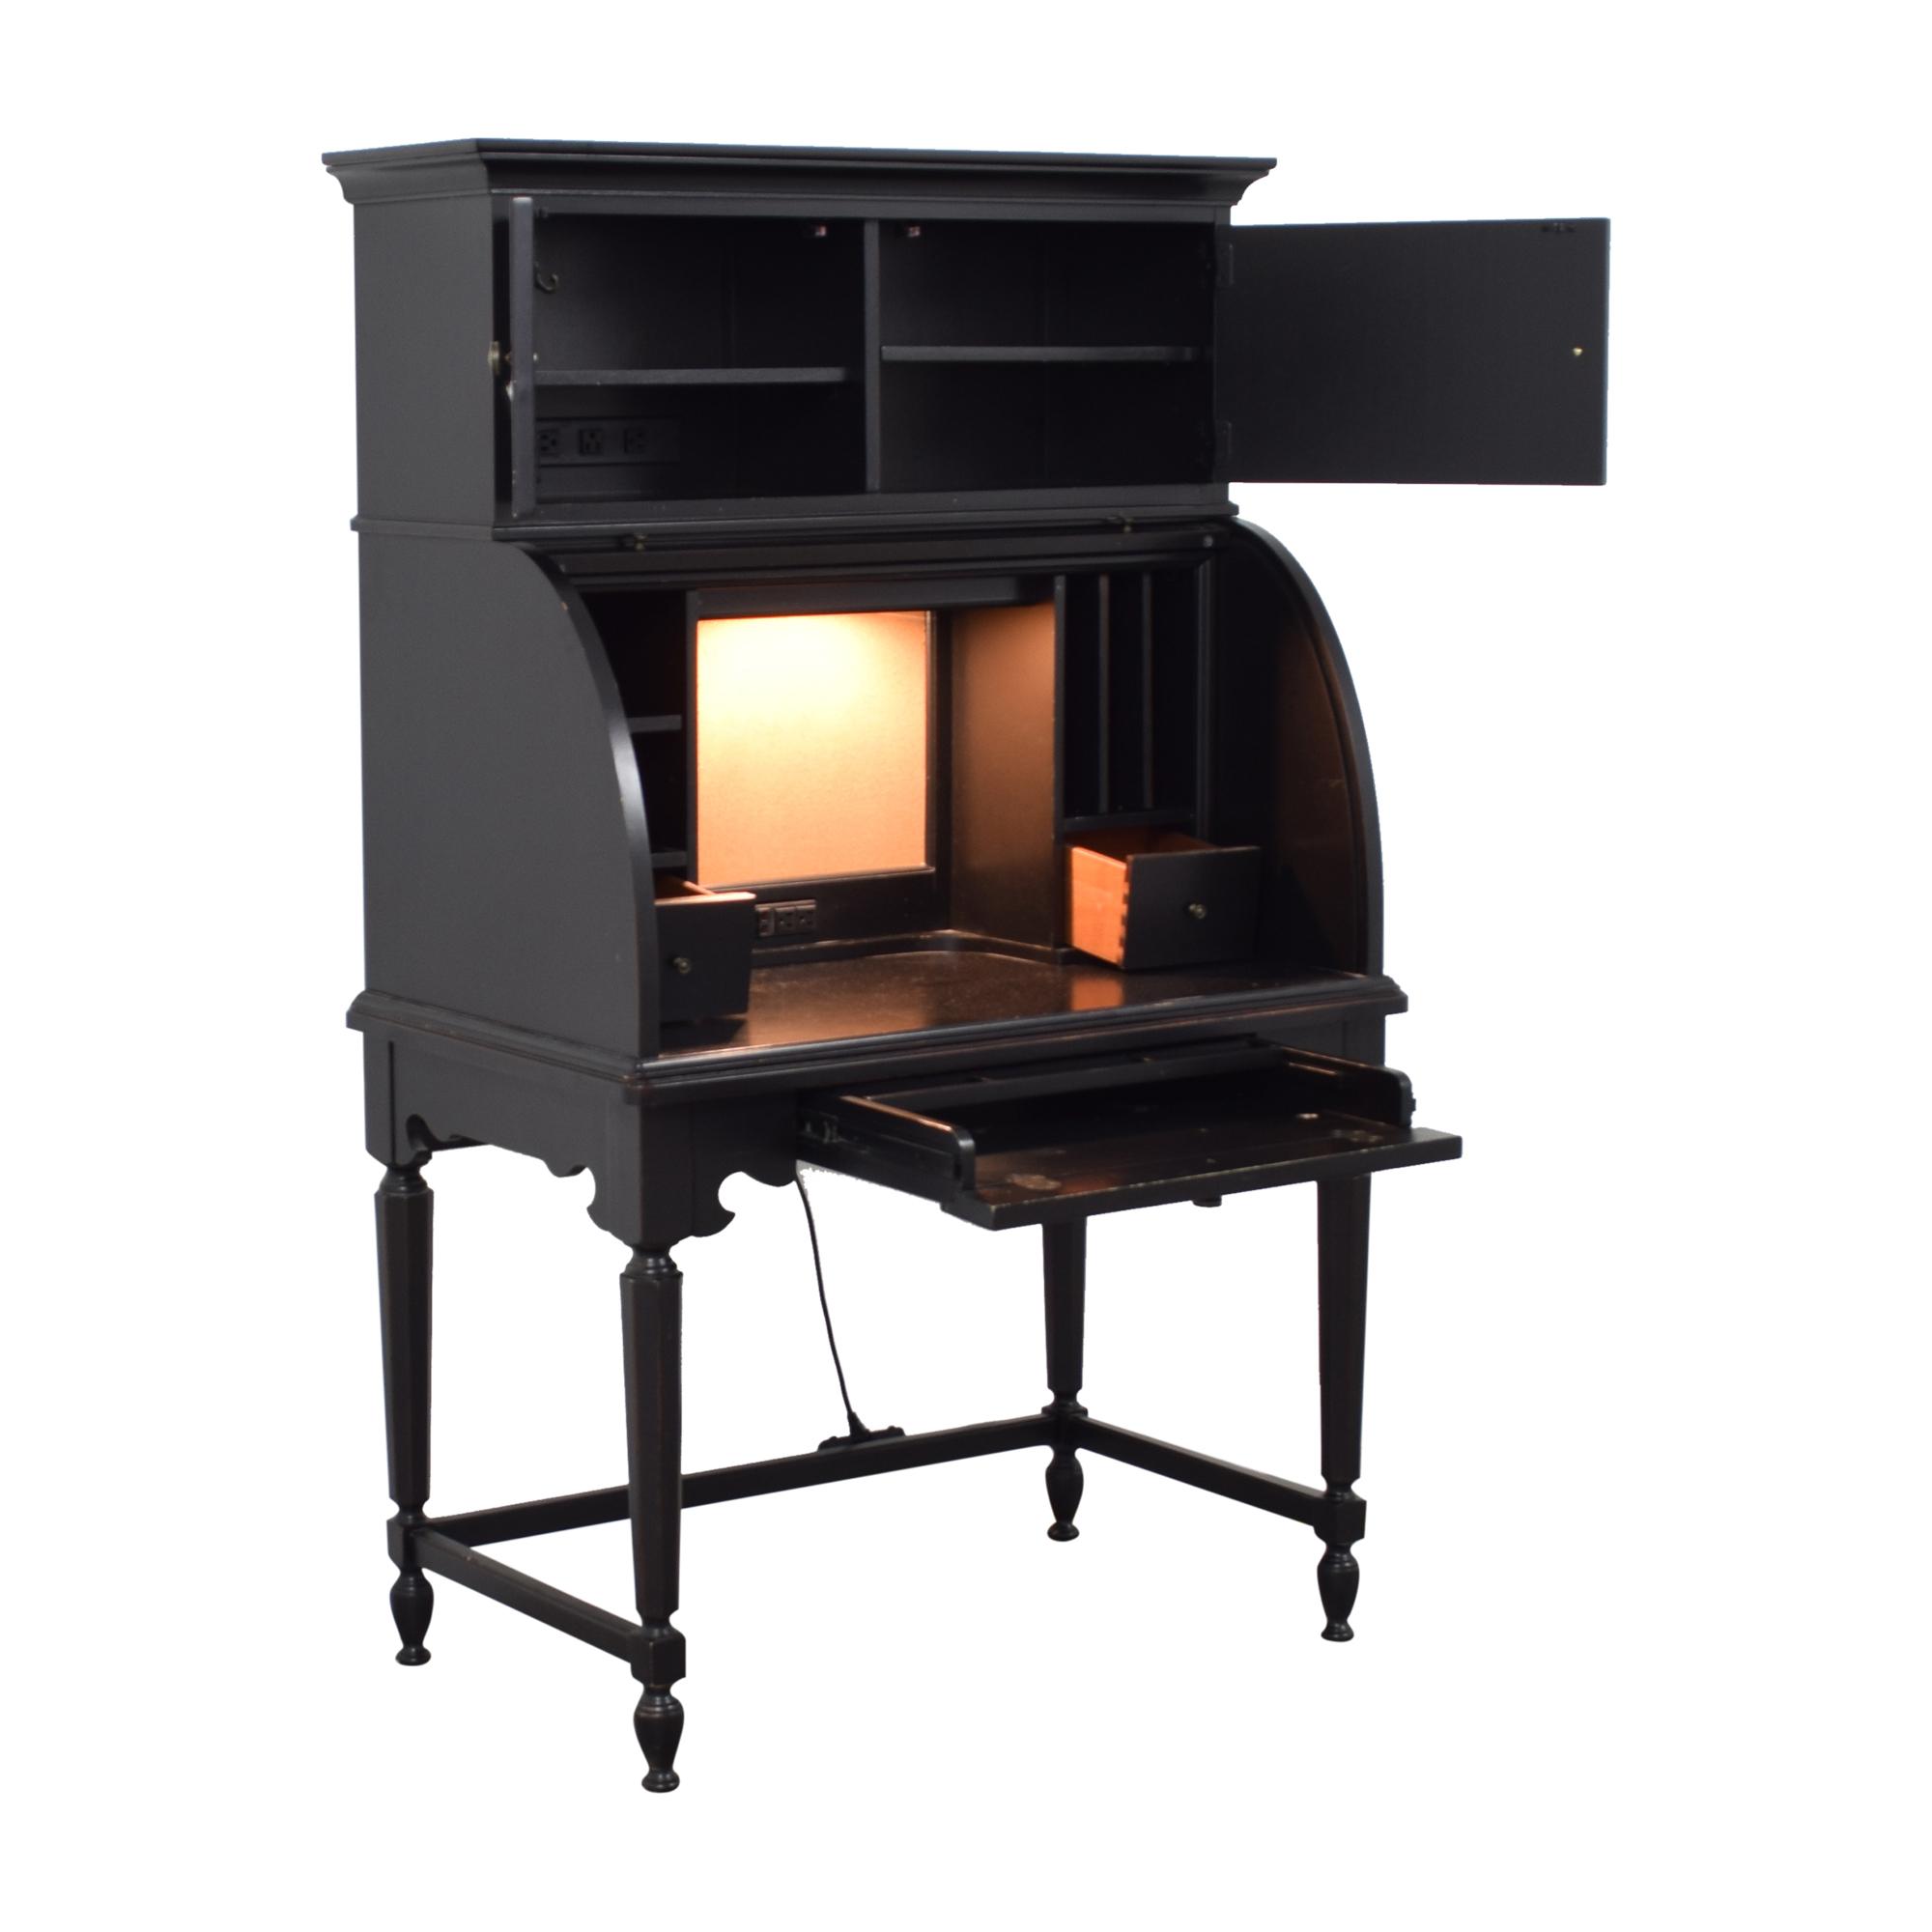 Suburban Furniture Suburban Furniture Roll Top Desk with Hutch  price